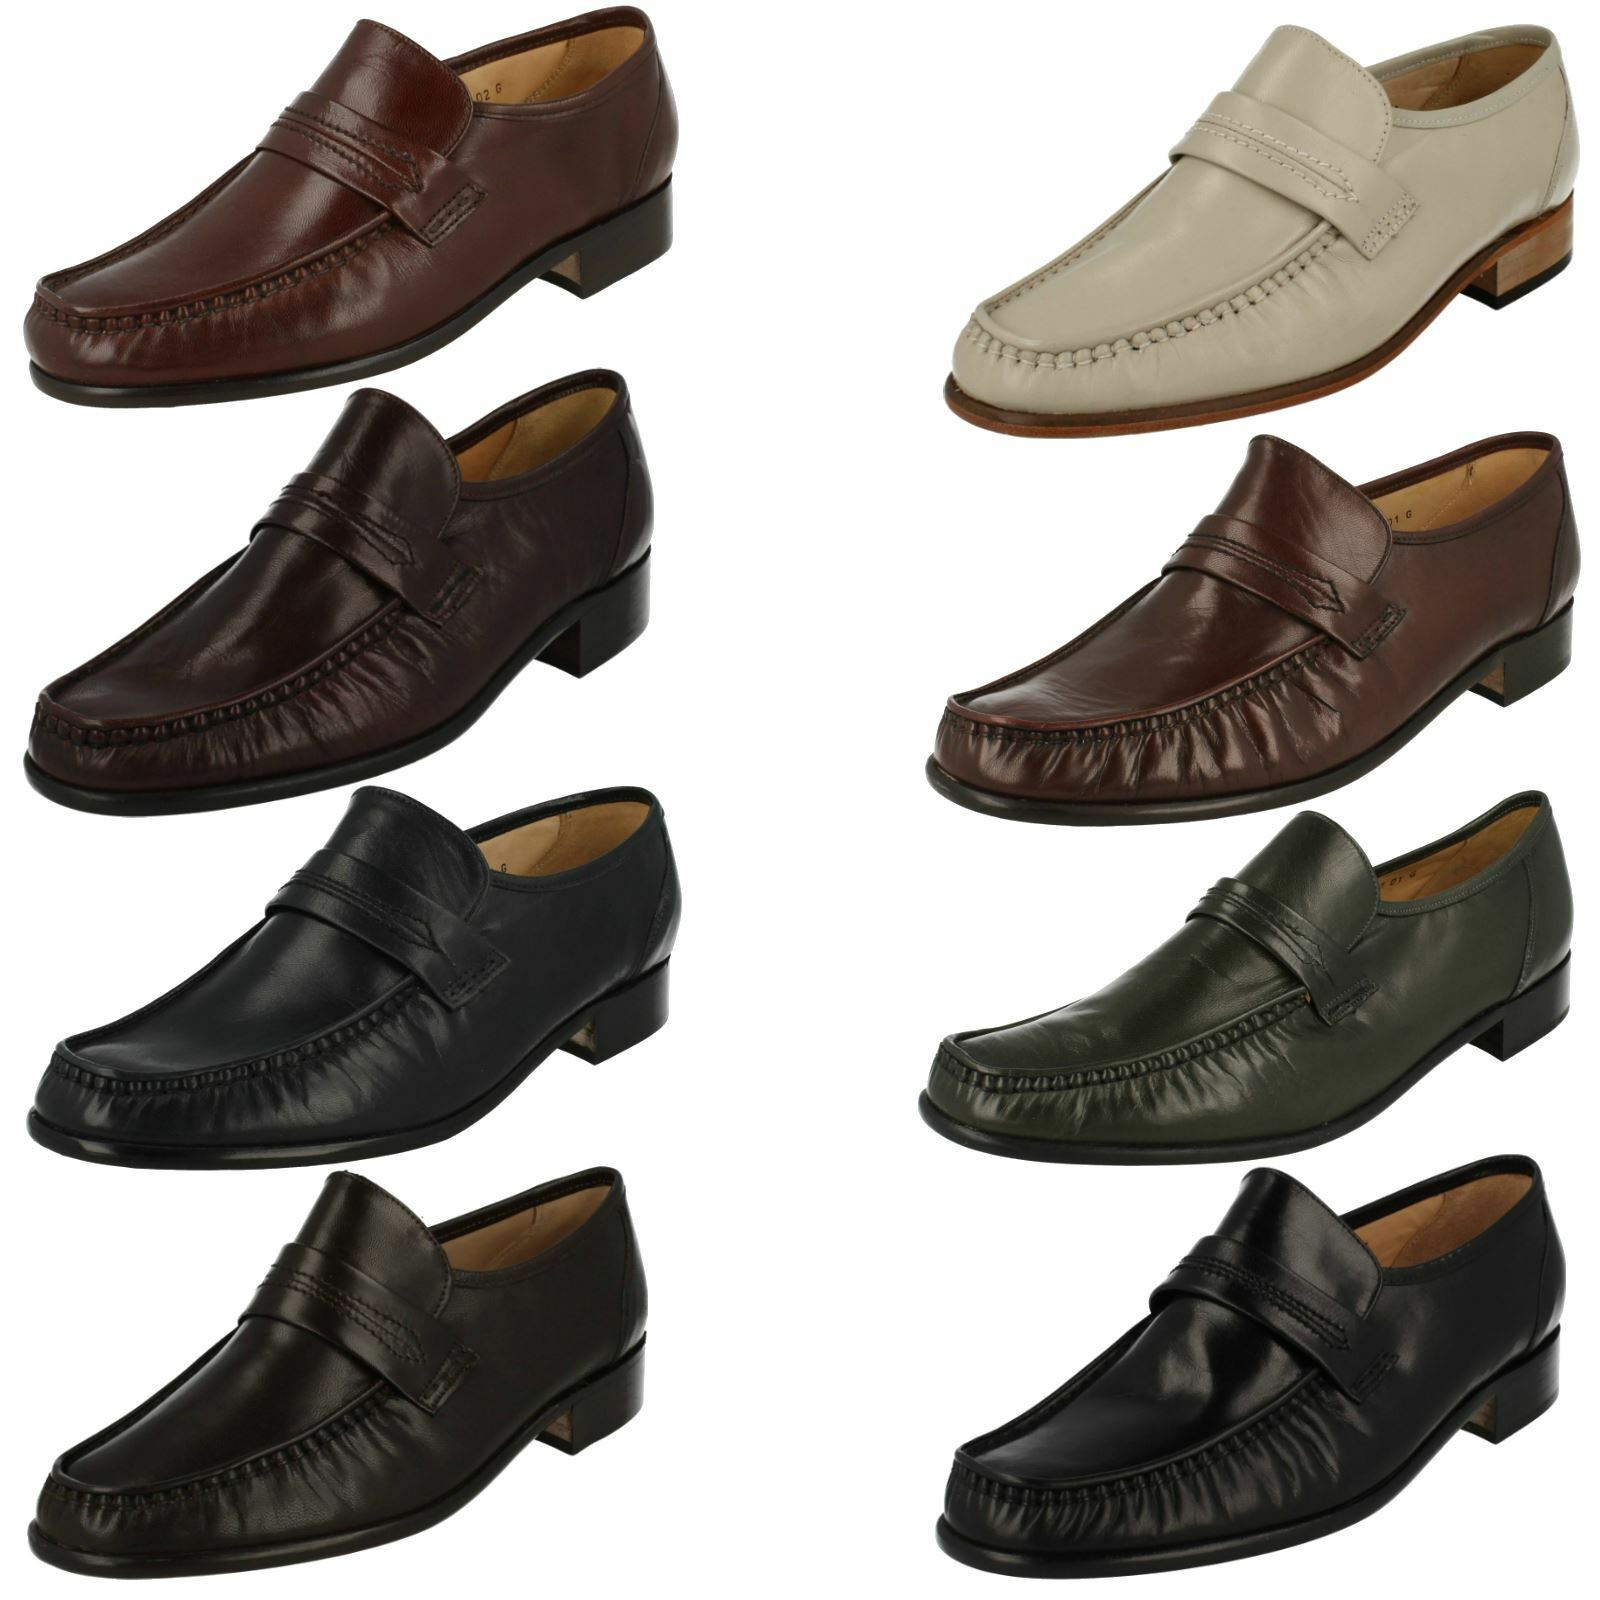 Herren Grensons Formal Moccasin Schuhes Watford